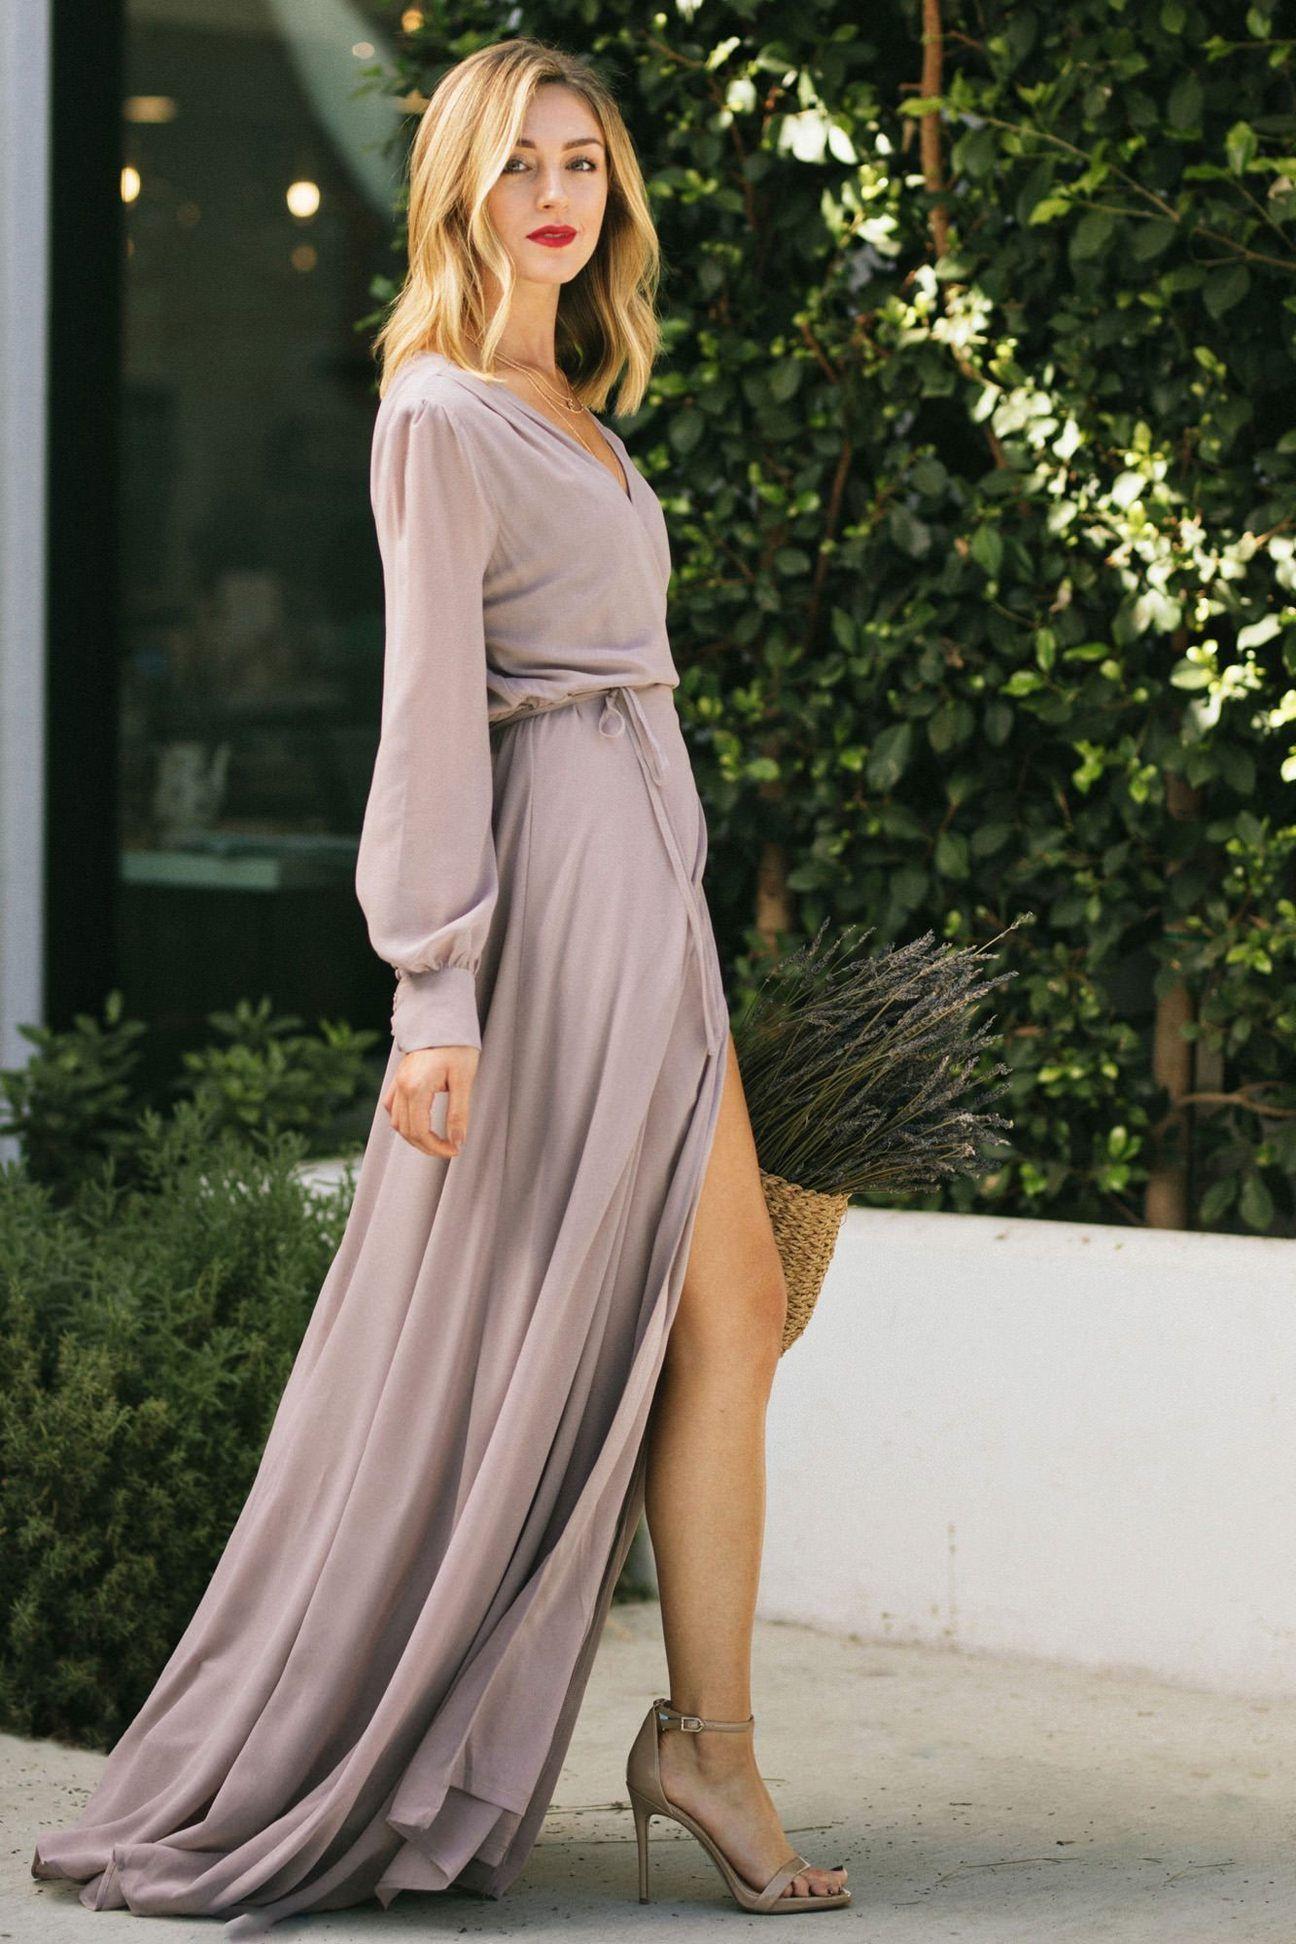 Chloe Long Sleeve Wrap Maxi Dress Long Sleeve Flowy Dresses Maxi Wrap Dress Maxi Dress [ 1944 x 1296 Pixel ]